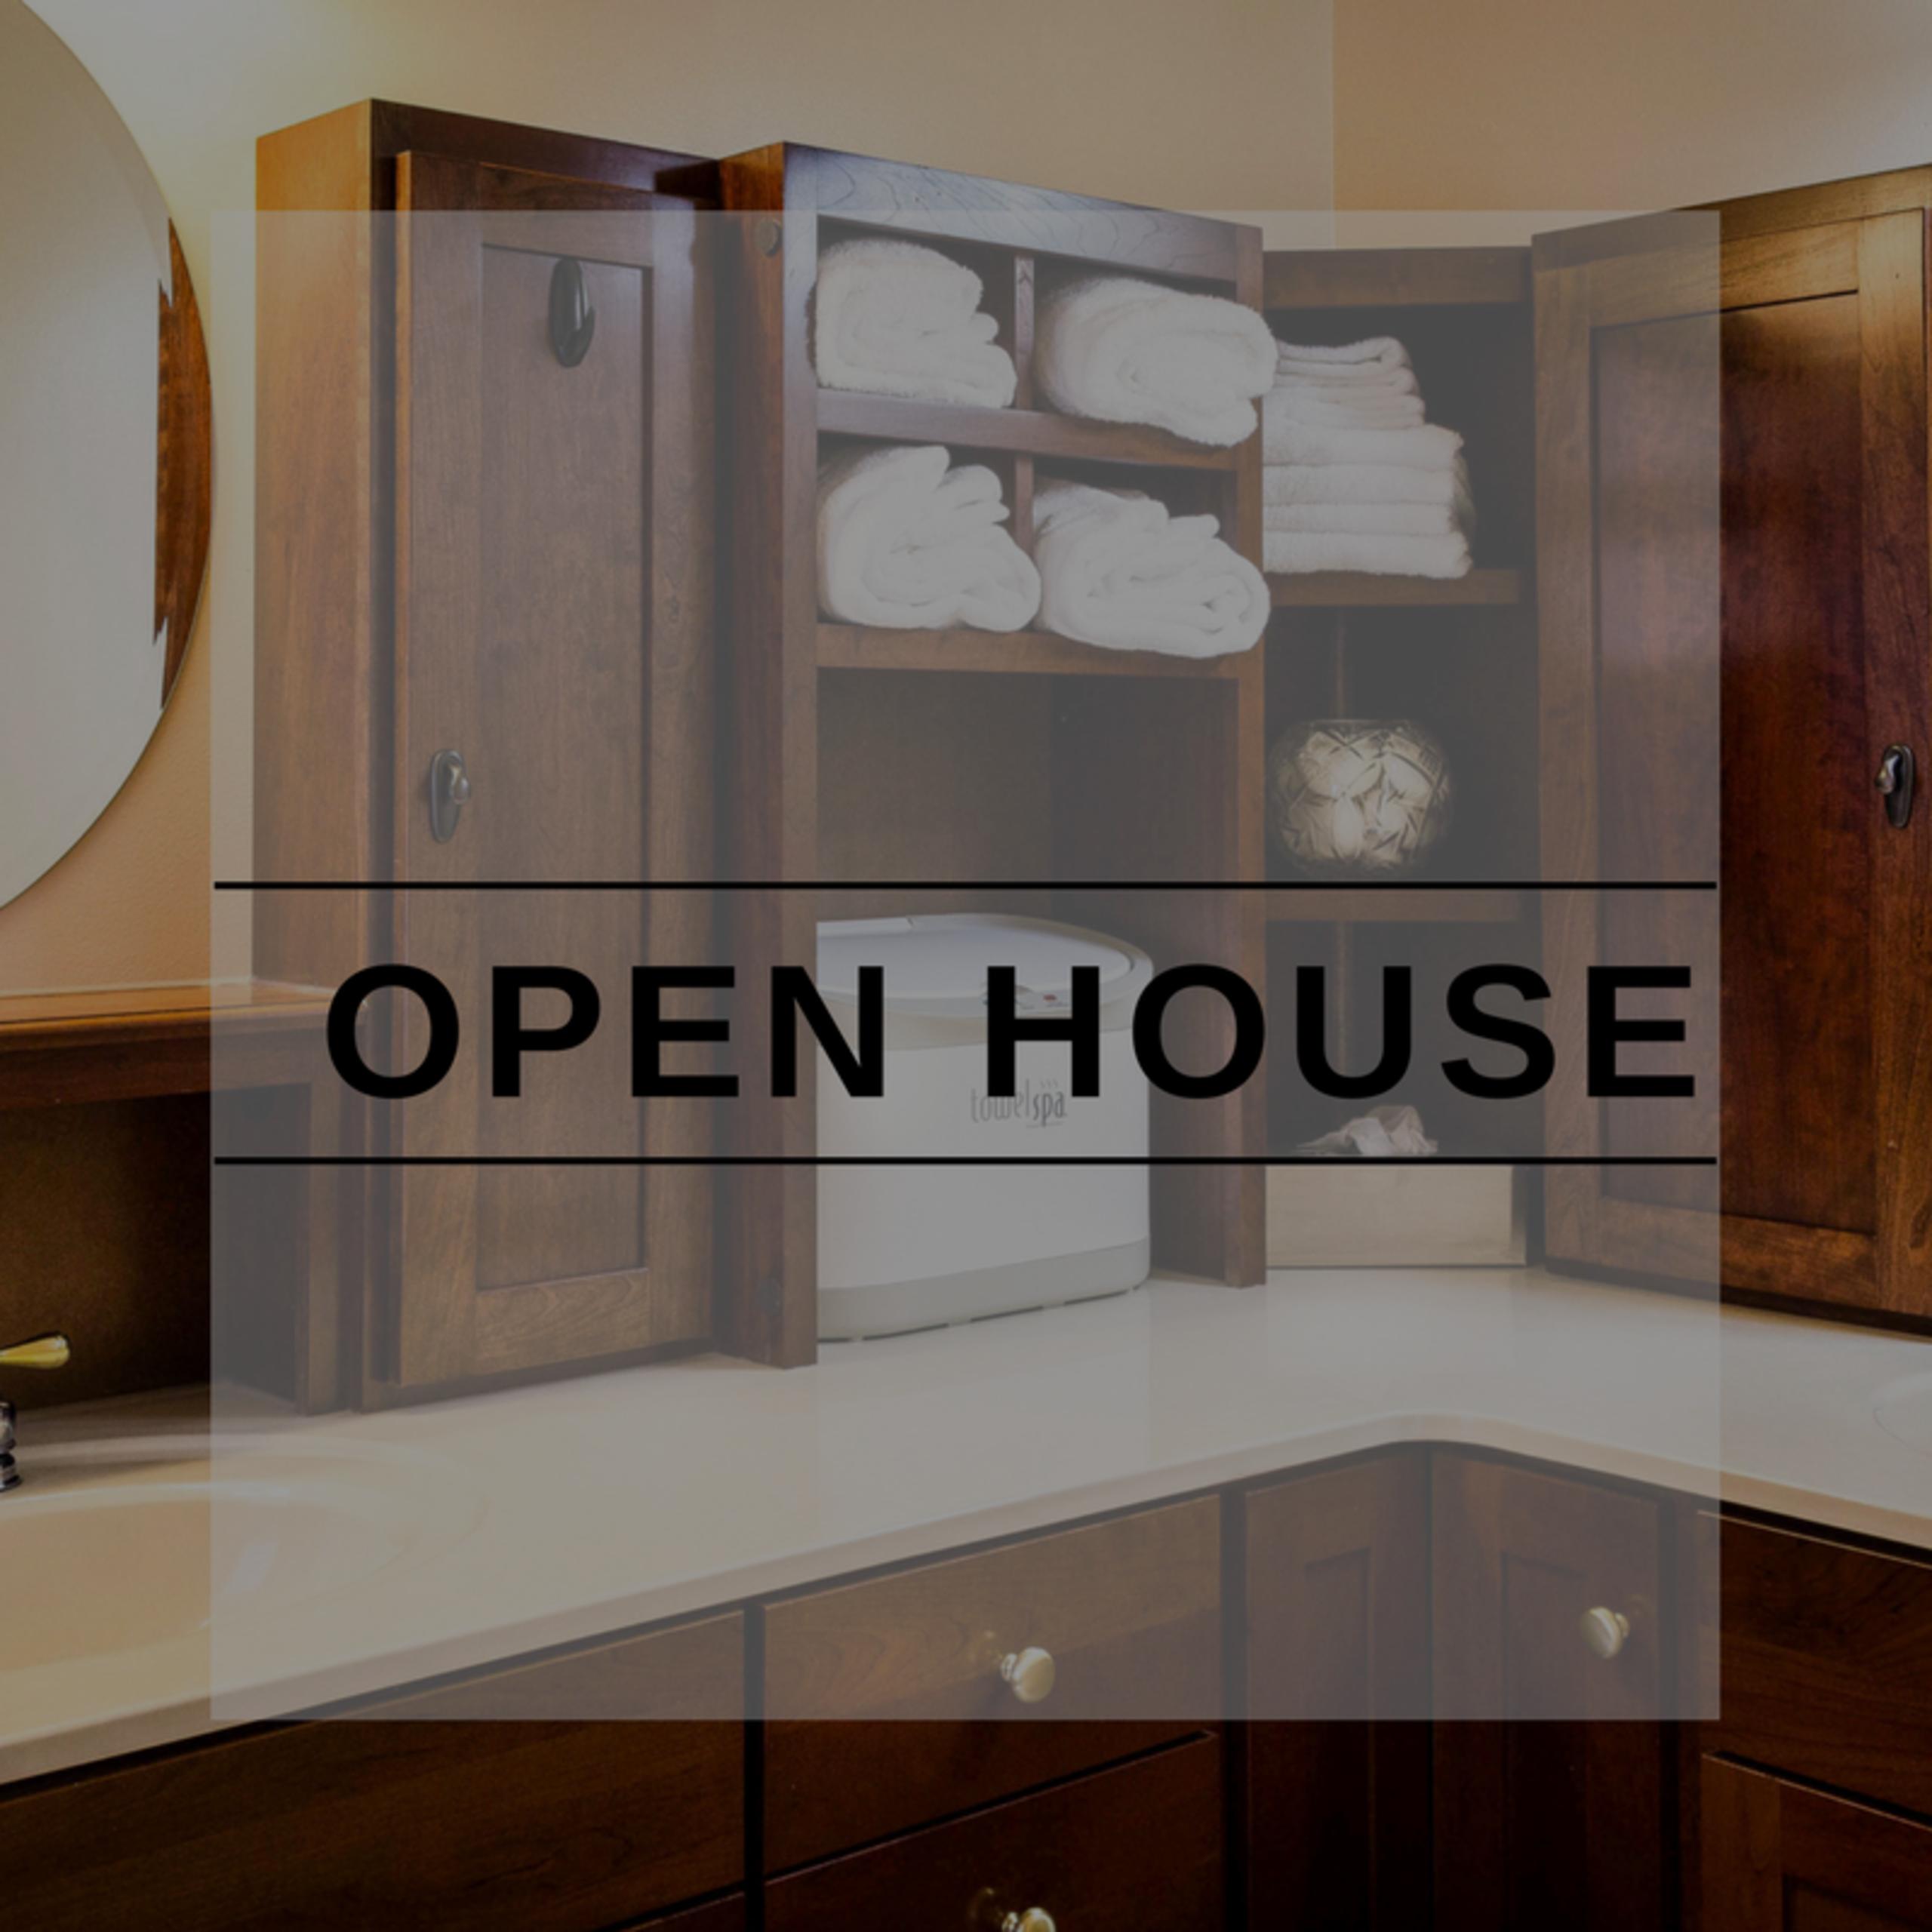 OPEN HOUSE LIST 2/3/18 – 2/4/18